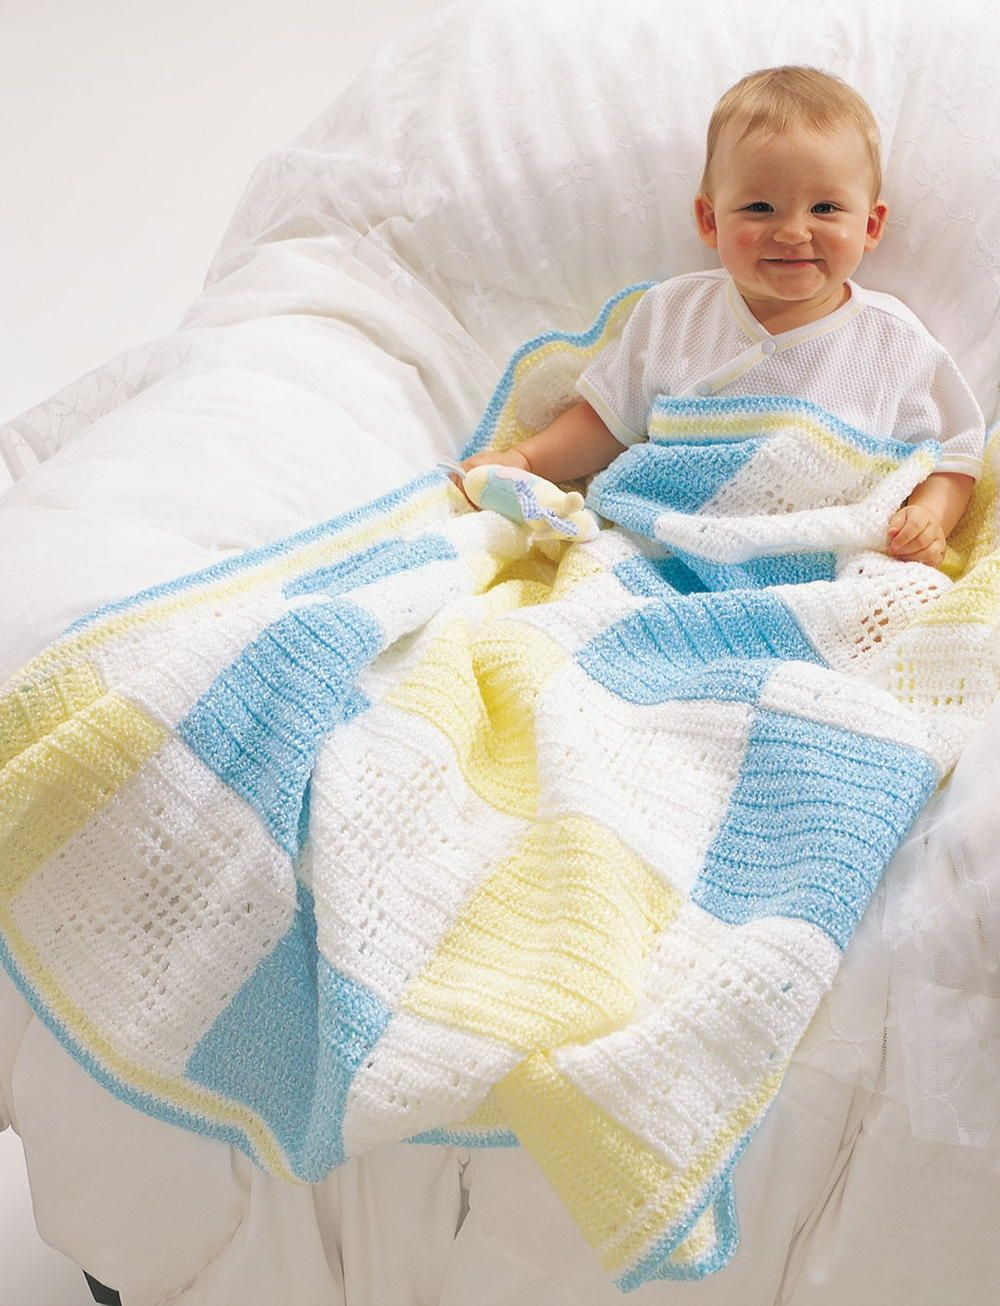 Baby Block Crochet Blanket | Blanco y Bebe